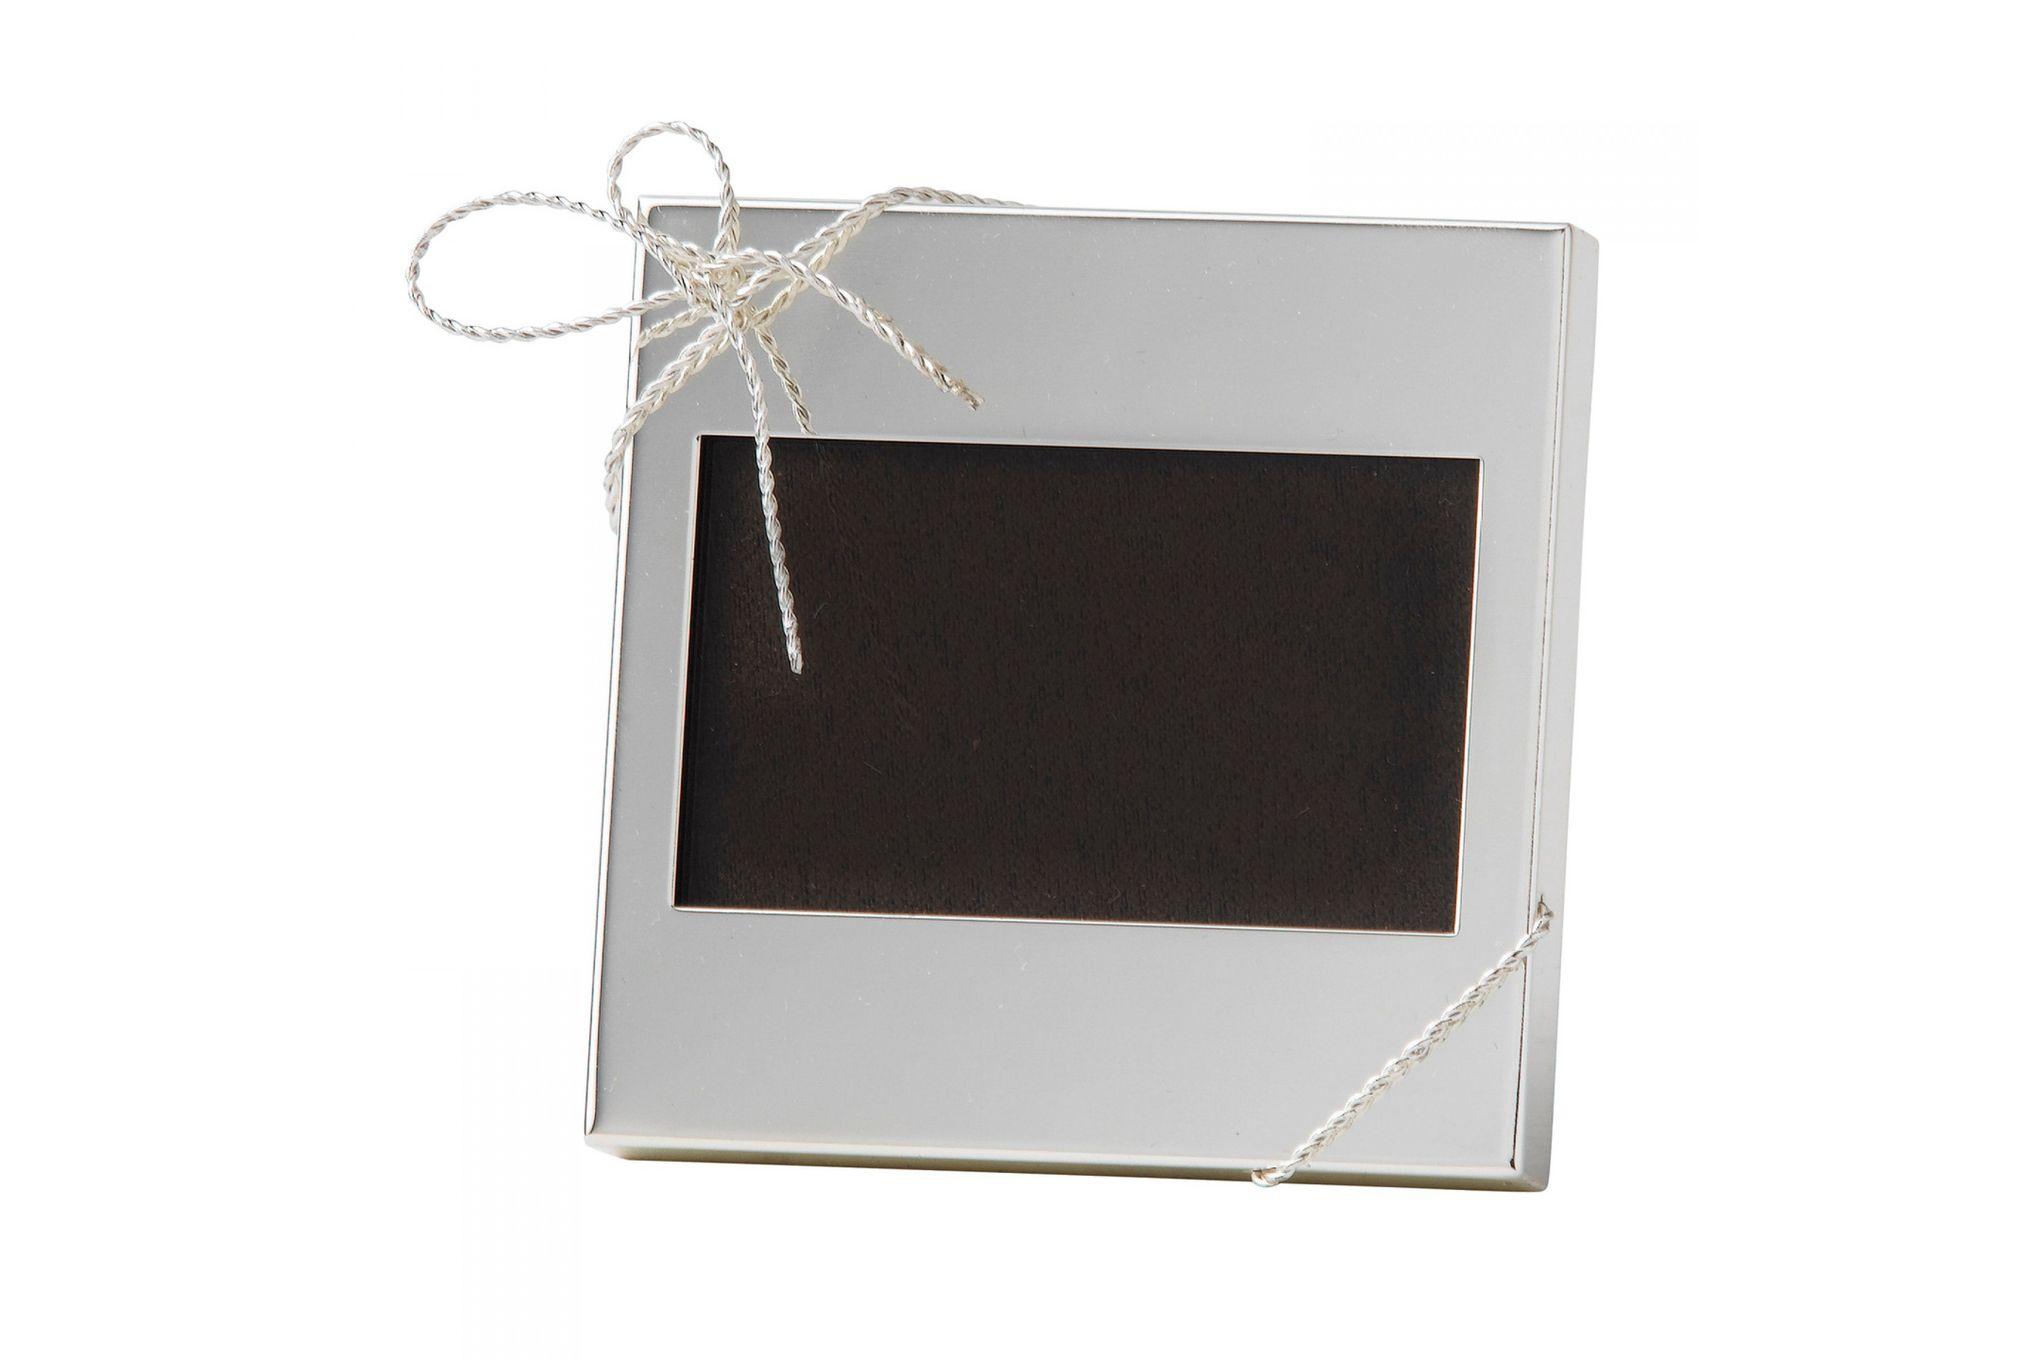 Vera Wang for Wedgwood Gifts & Accessories Individual Mini Frame Love Knots 6 x 4cm thumb 1